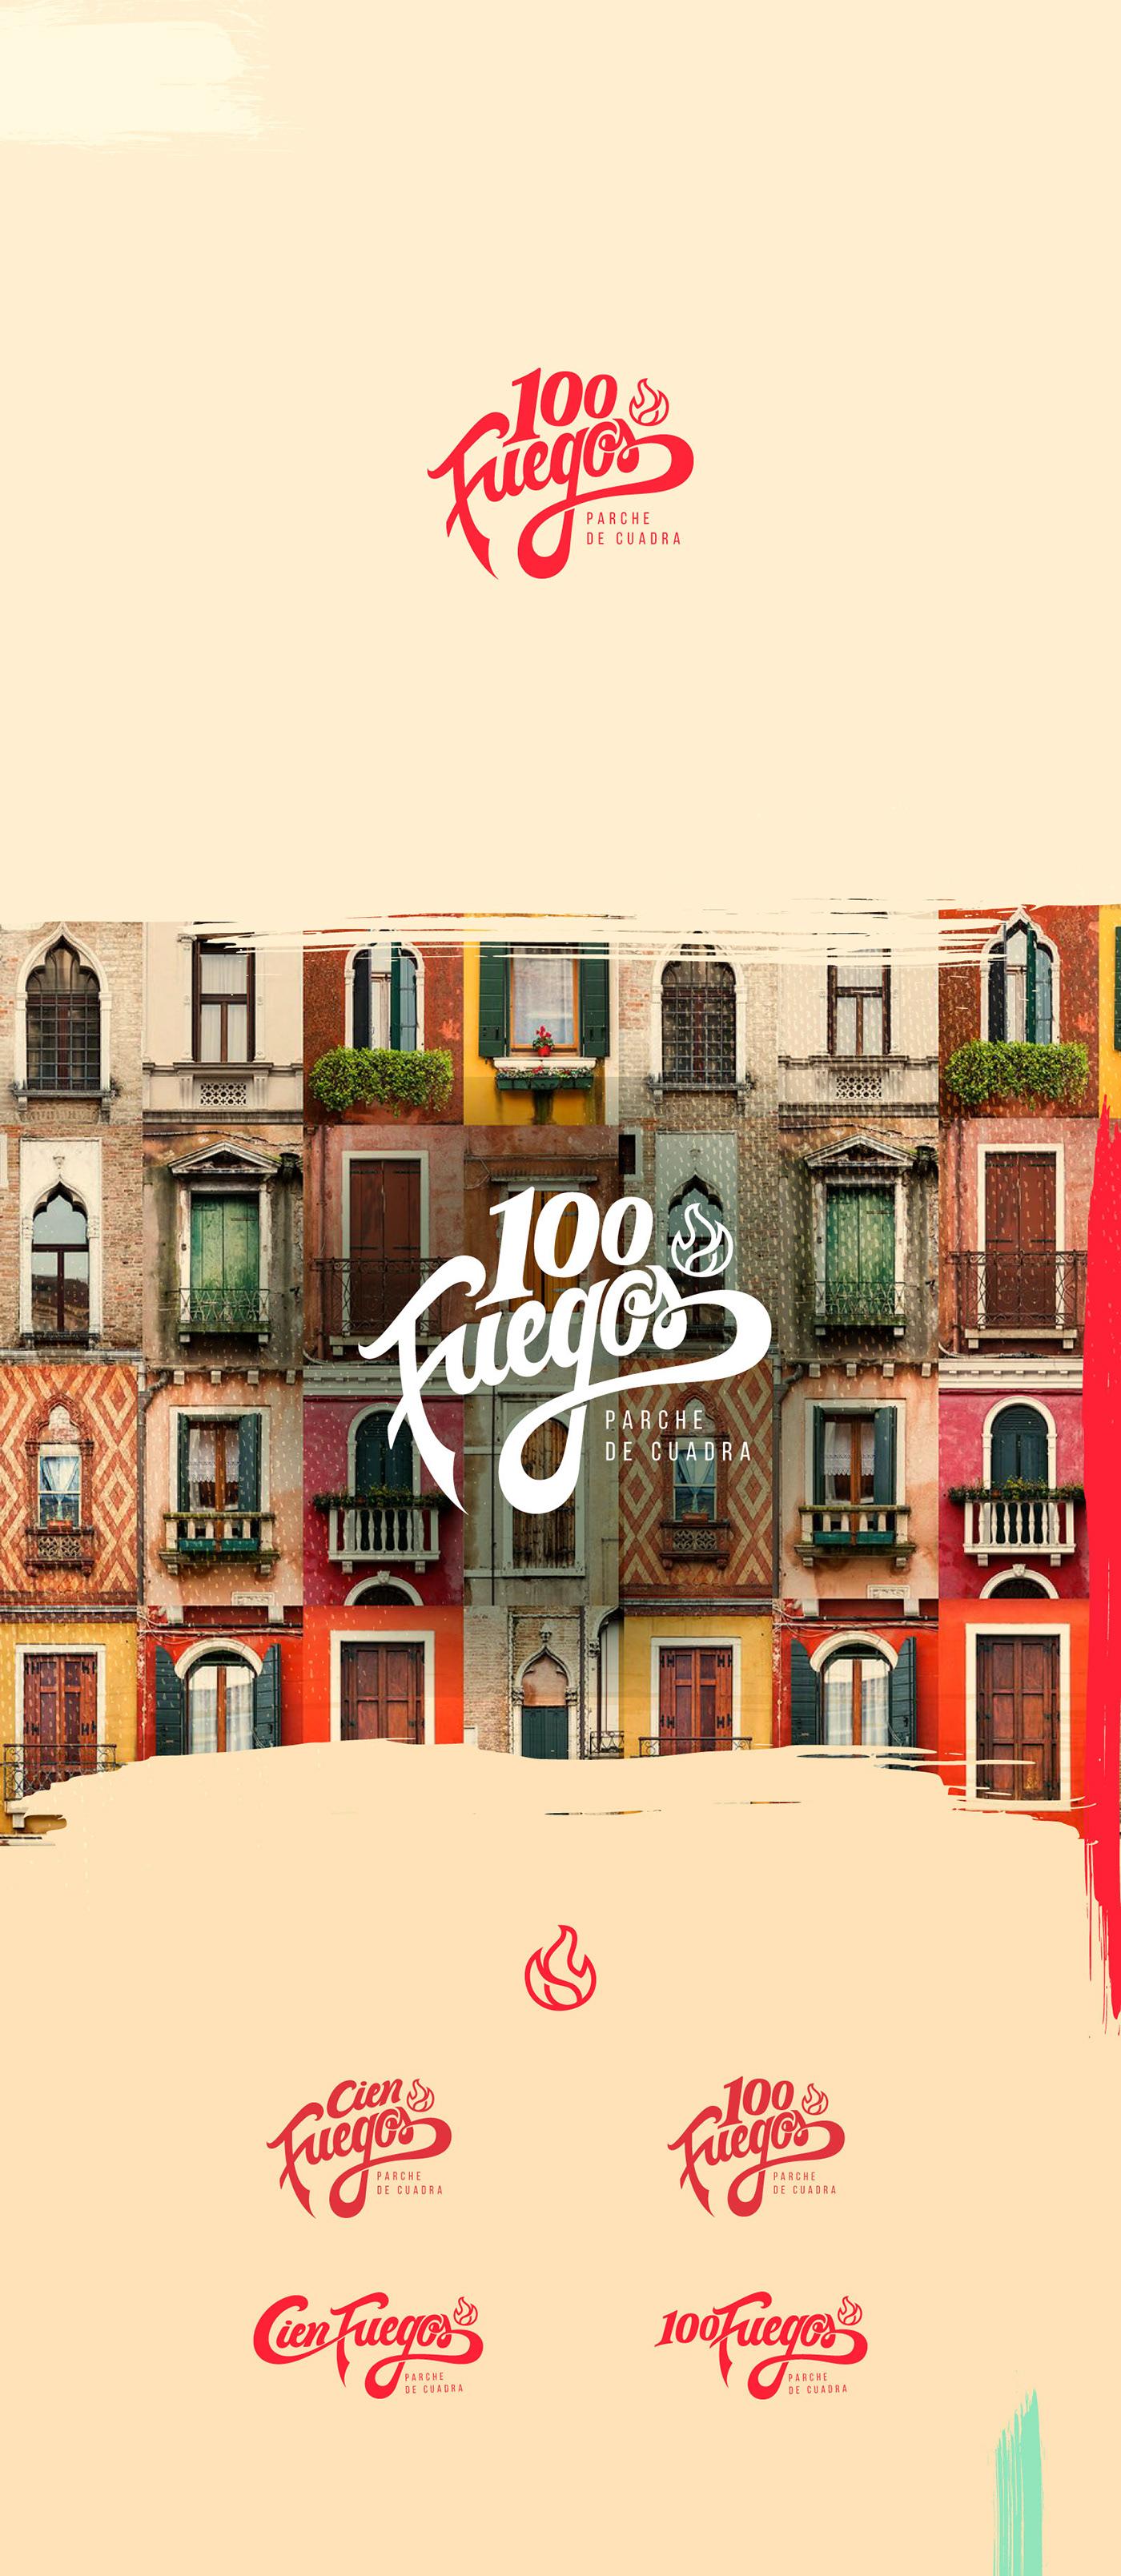 branding ,marca,brand,bar,girl,colombia,cuba,latina,Caribe,Illustrator